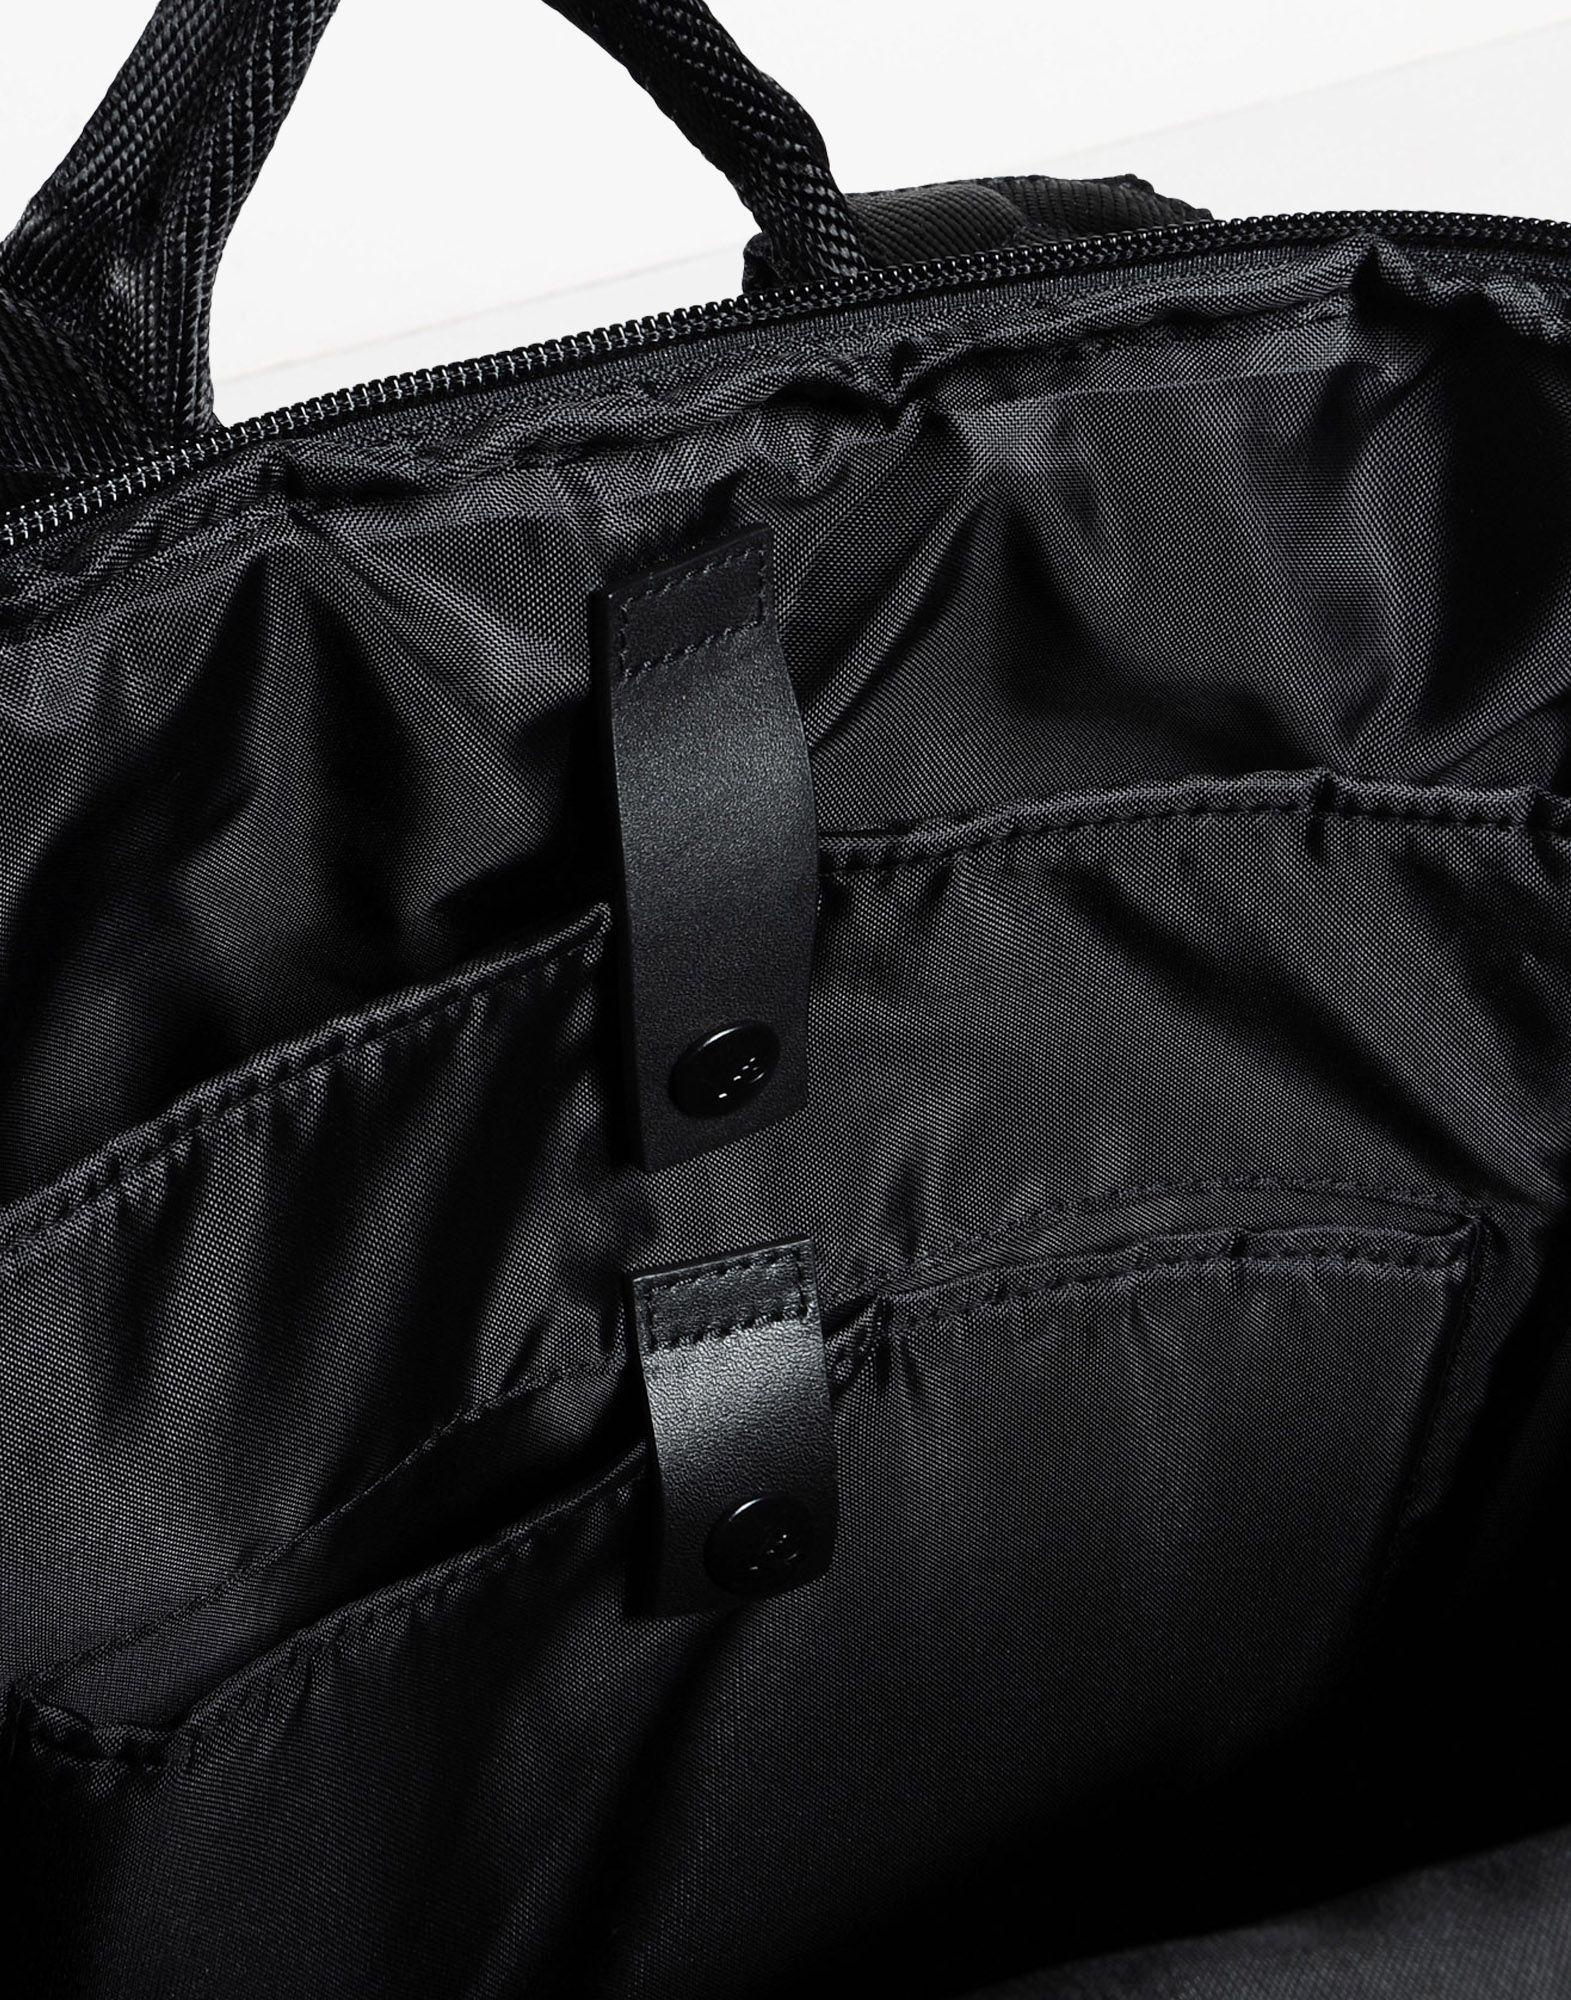 8439bce8788a Y-3 Y-3 QASA S BACKPACK Backpack E ...